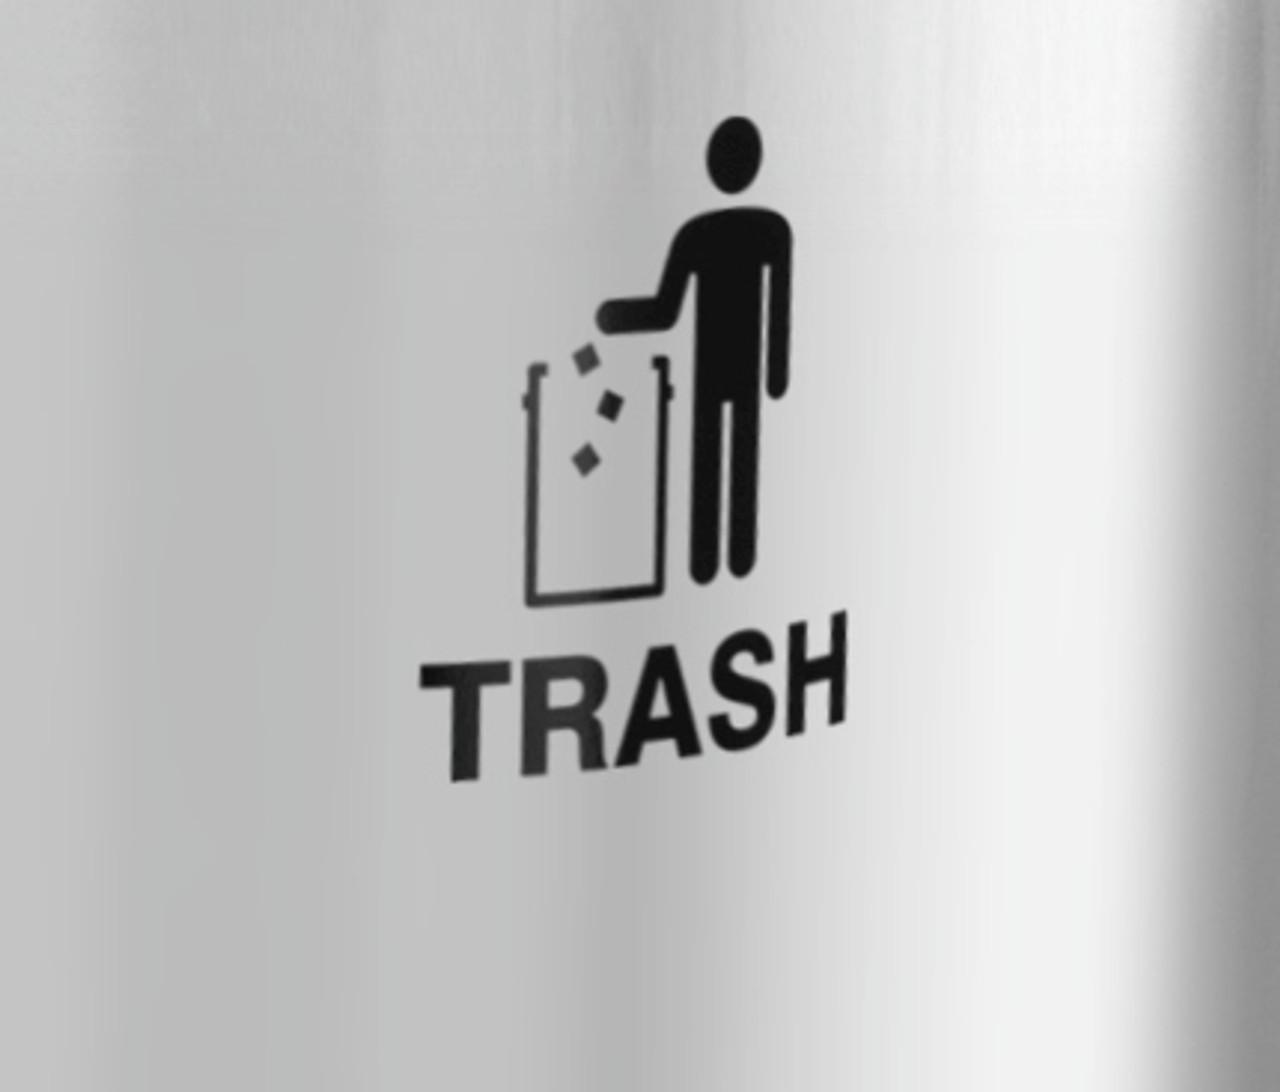 Trash with Tidy Man Logo